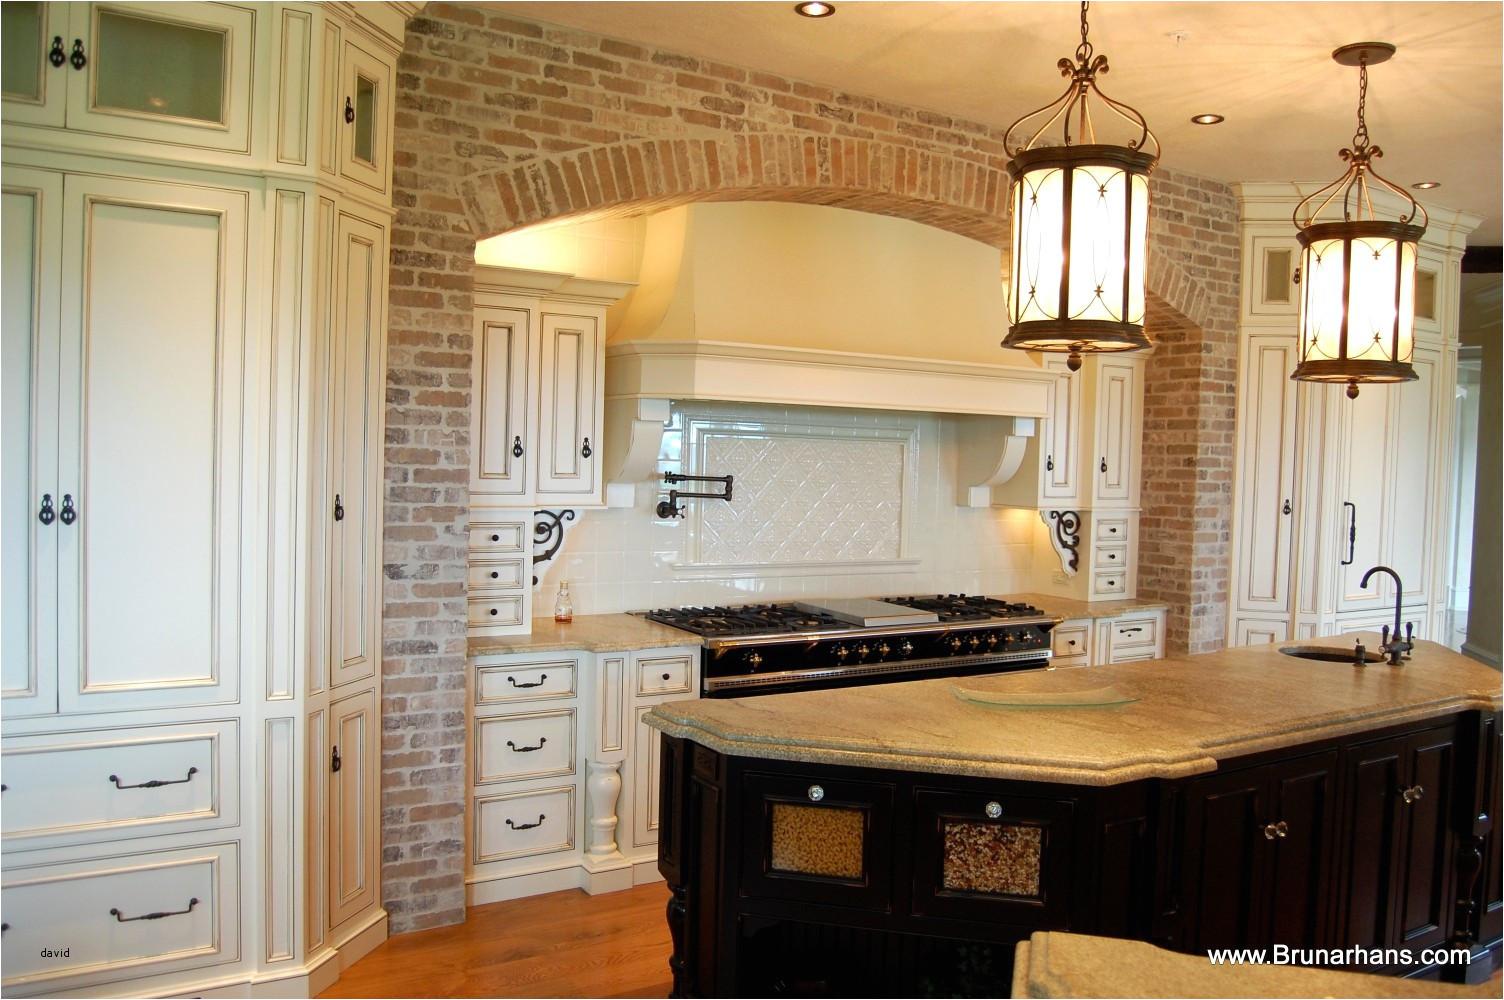 antique kitchen sinks inspirational 33 lovely best kitchen cabinets concept